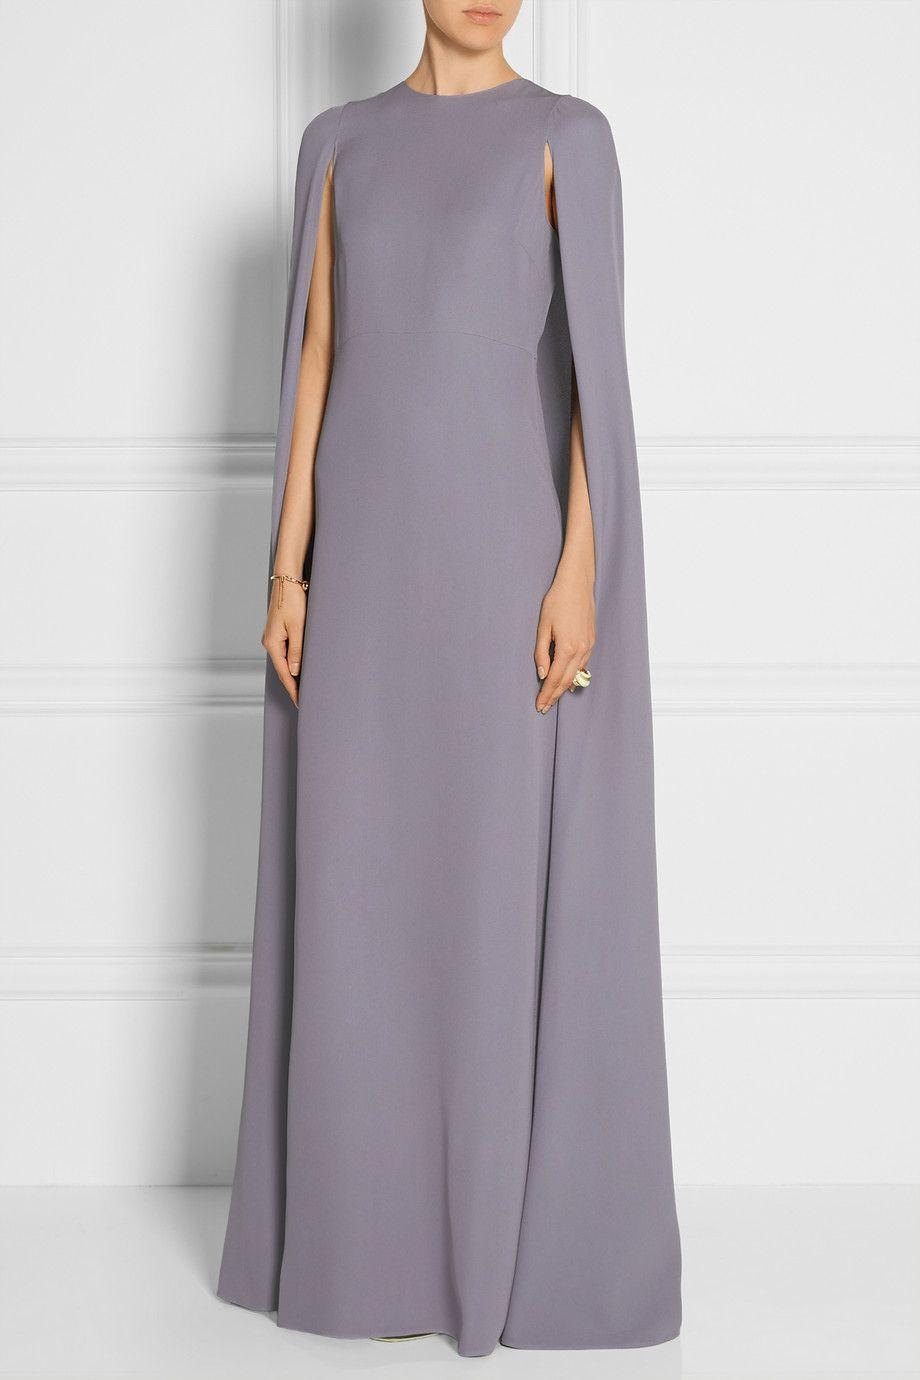 Valentino silkcady cape gown netaportercom evening wear